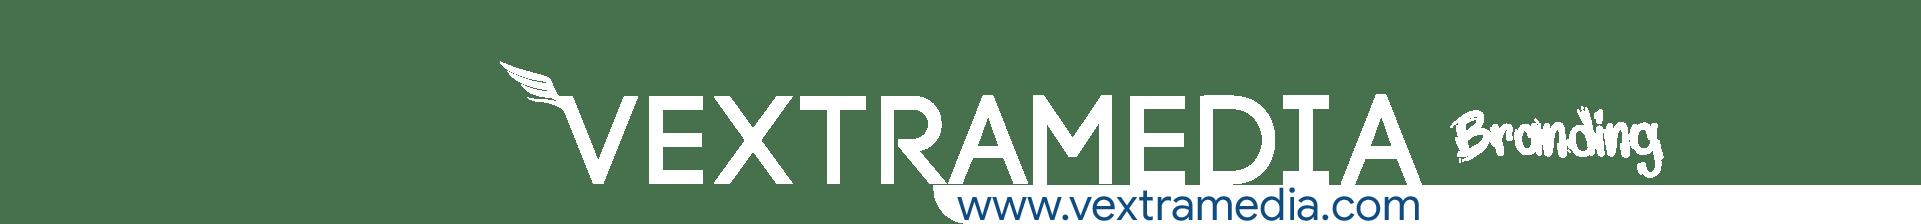 cabecera-Branding-vextramedia-